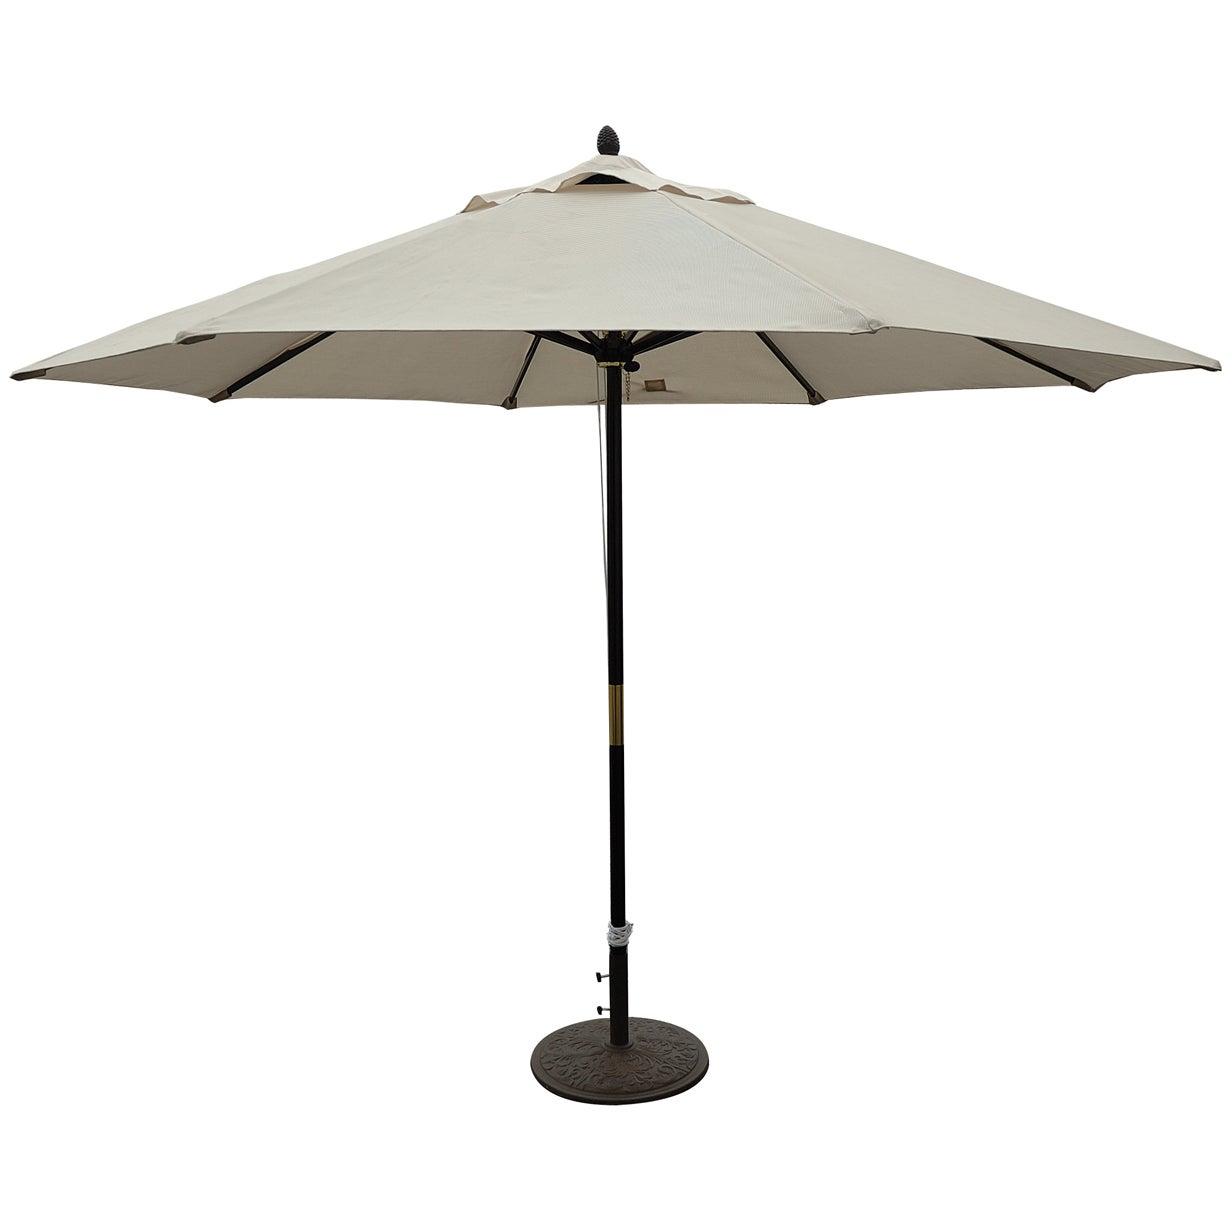 Tropishade 11 Ft Dark Wood Market Umbrella With Beige Olefin Cover As Is Item 11 Dark Wood Large Patio Umbrellas Backyard Patio Furniture Patio Umbrellas